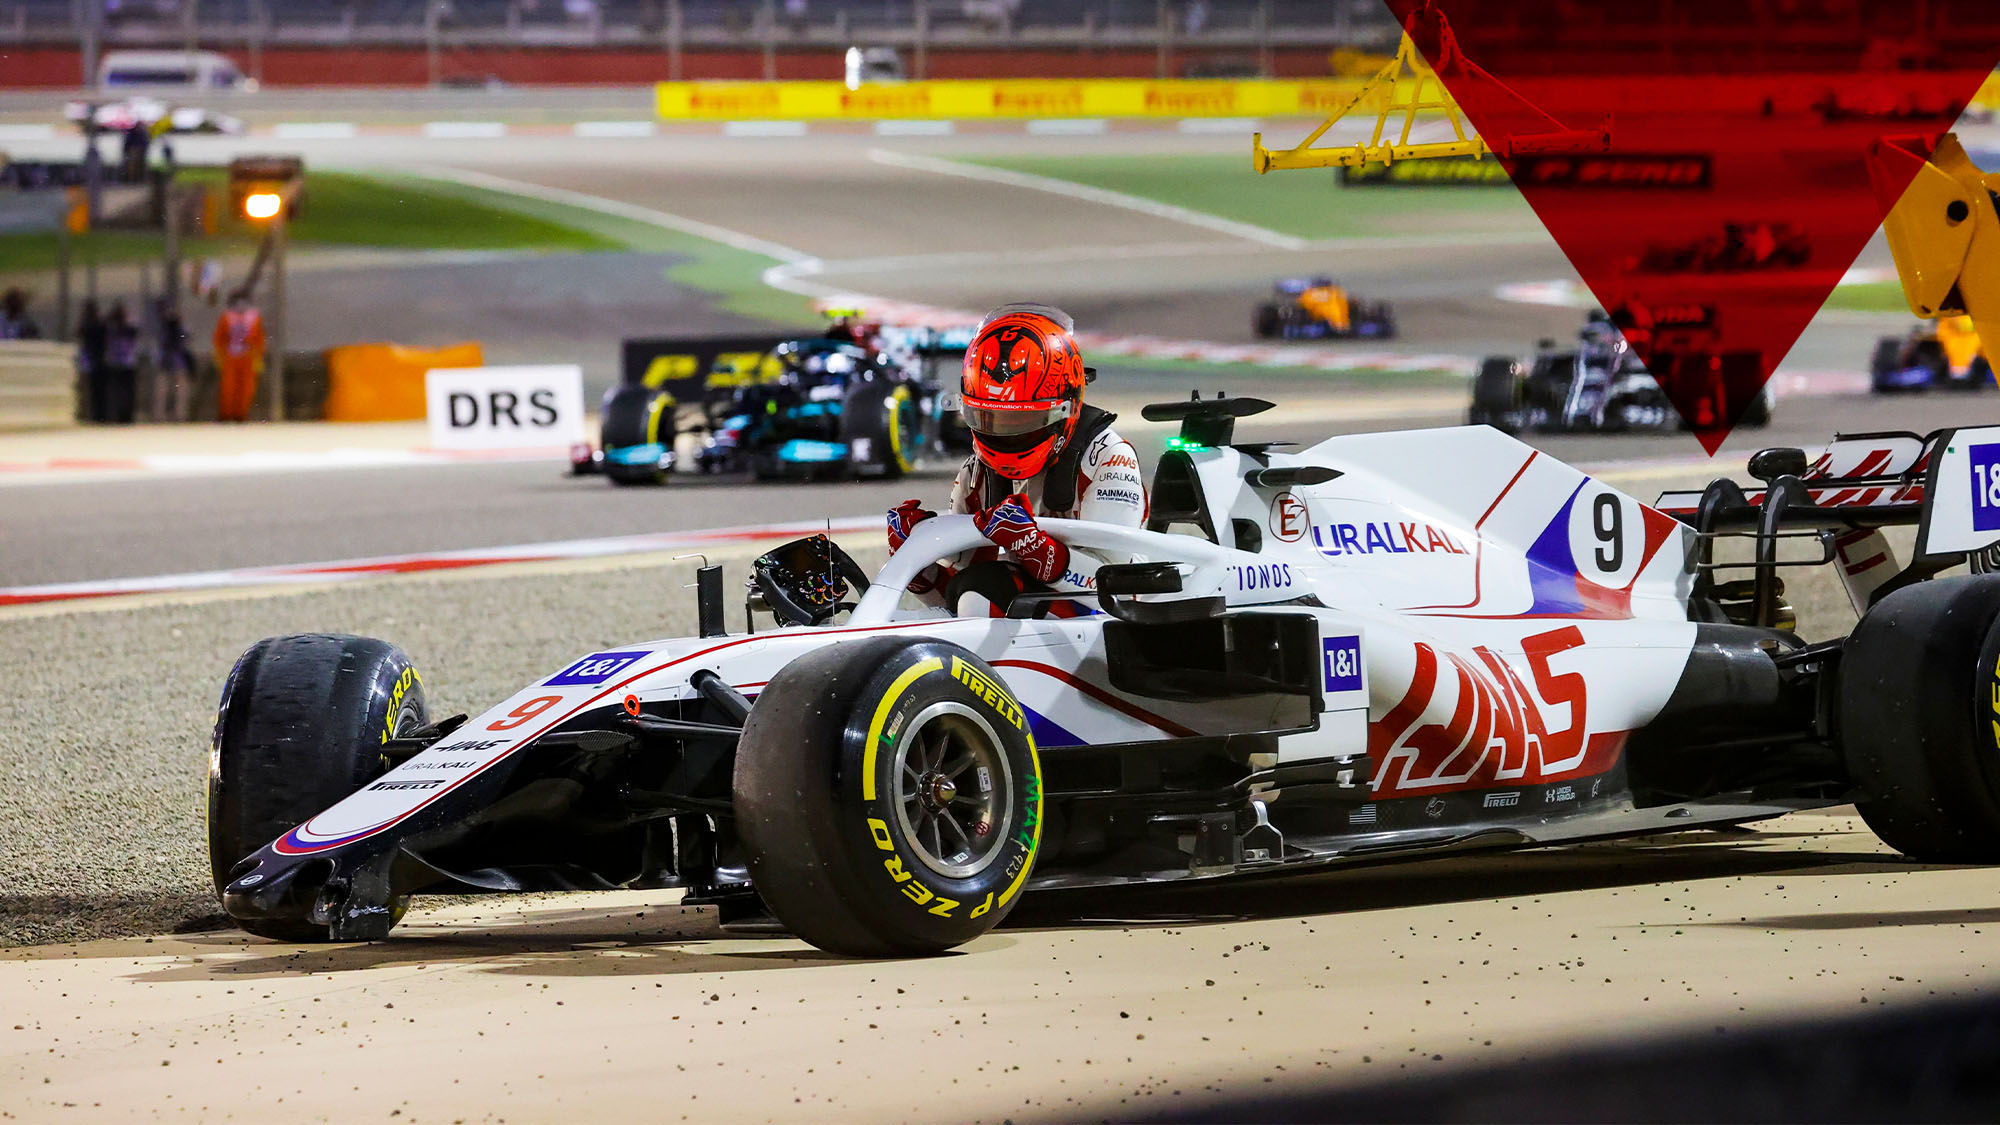 Crash 09 MAZEPIN Nikita (rus), Haas F1 Team VF-21 Ferrari, action during Formula 1 Gulf Air Bahrain Grand Prix 2021 from March 26 to 28, 2021 on the Bahrain International Circuit, in Sakhir, Bahrain - Photo DPPI